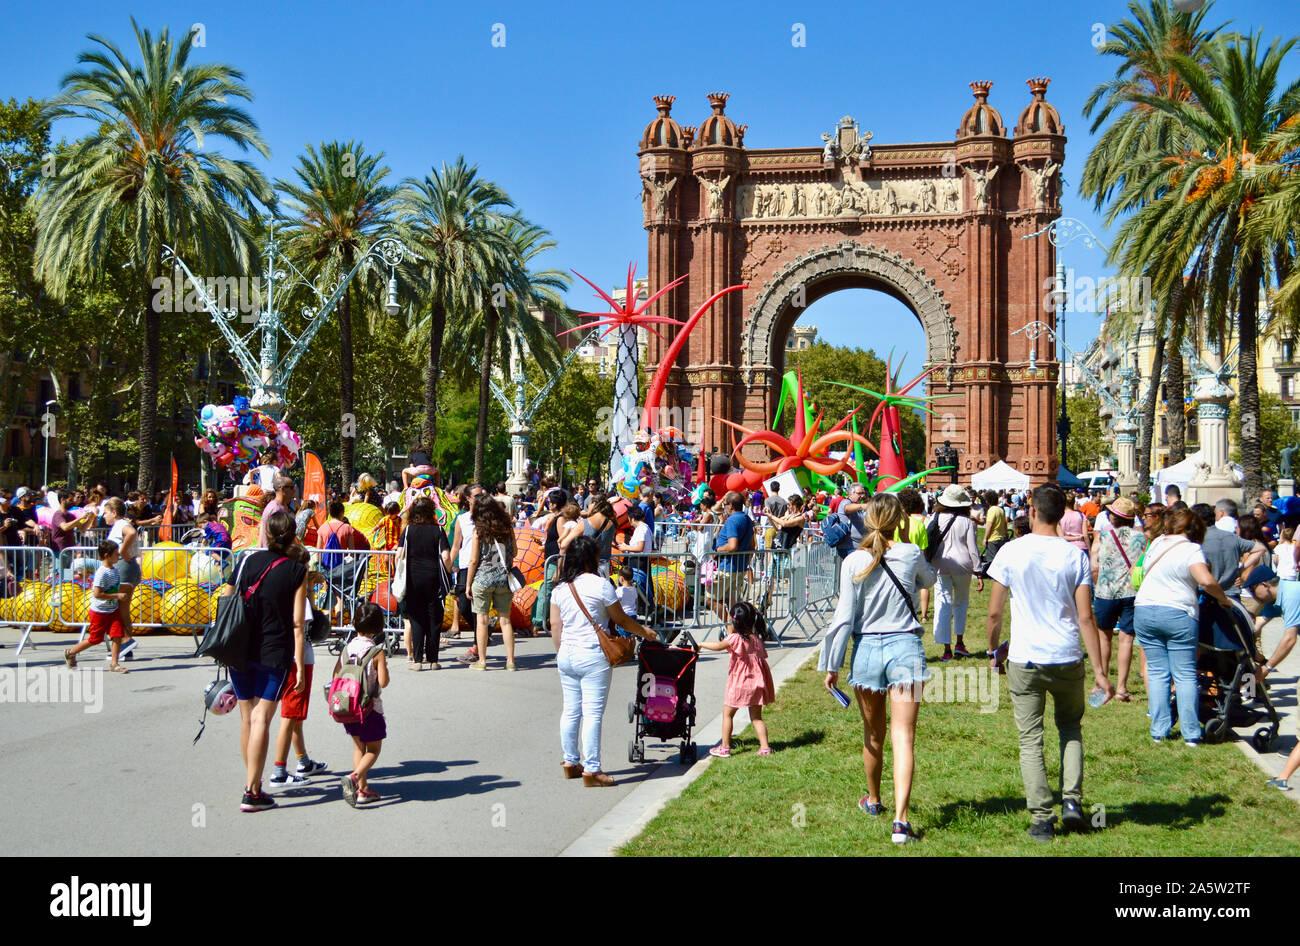 Les gens à Ciutadella Park pendant la Merce 2019 à Barcelone, Espagne Banque D'Images